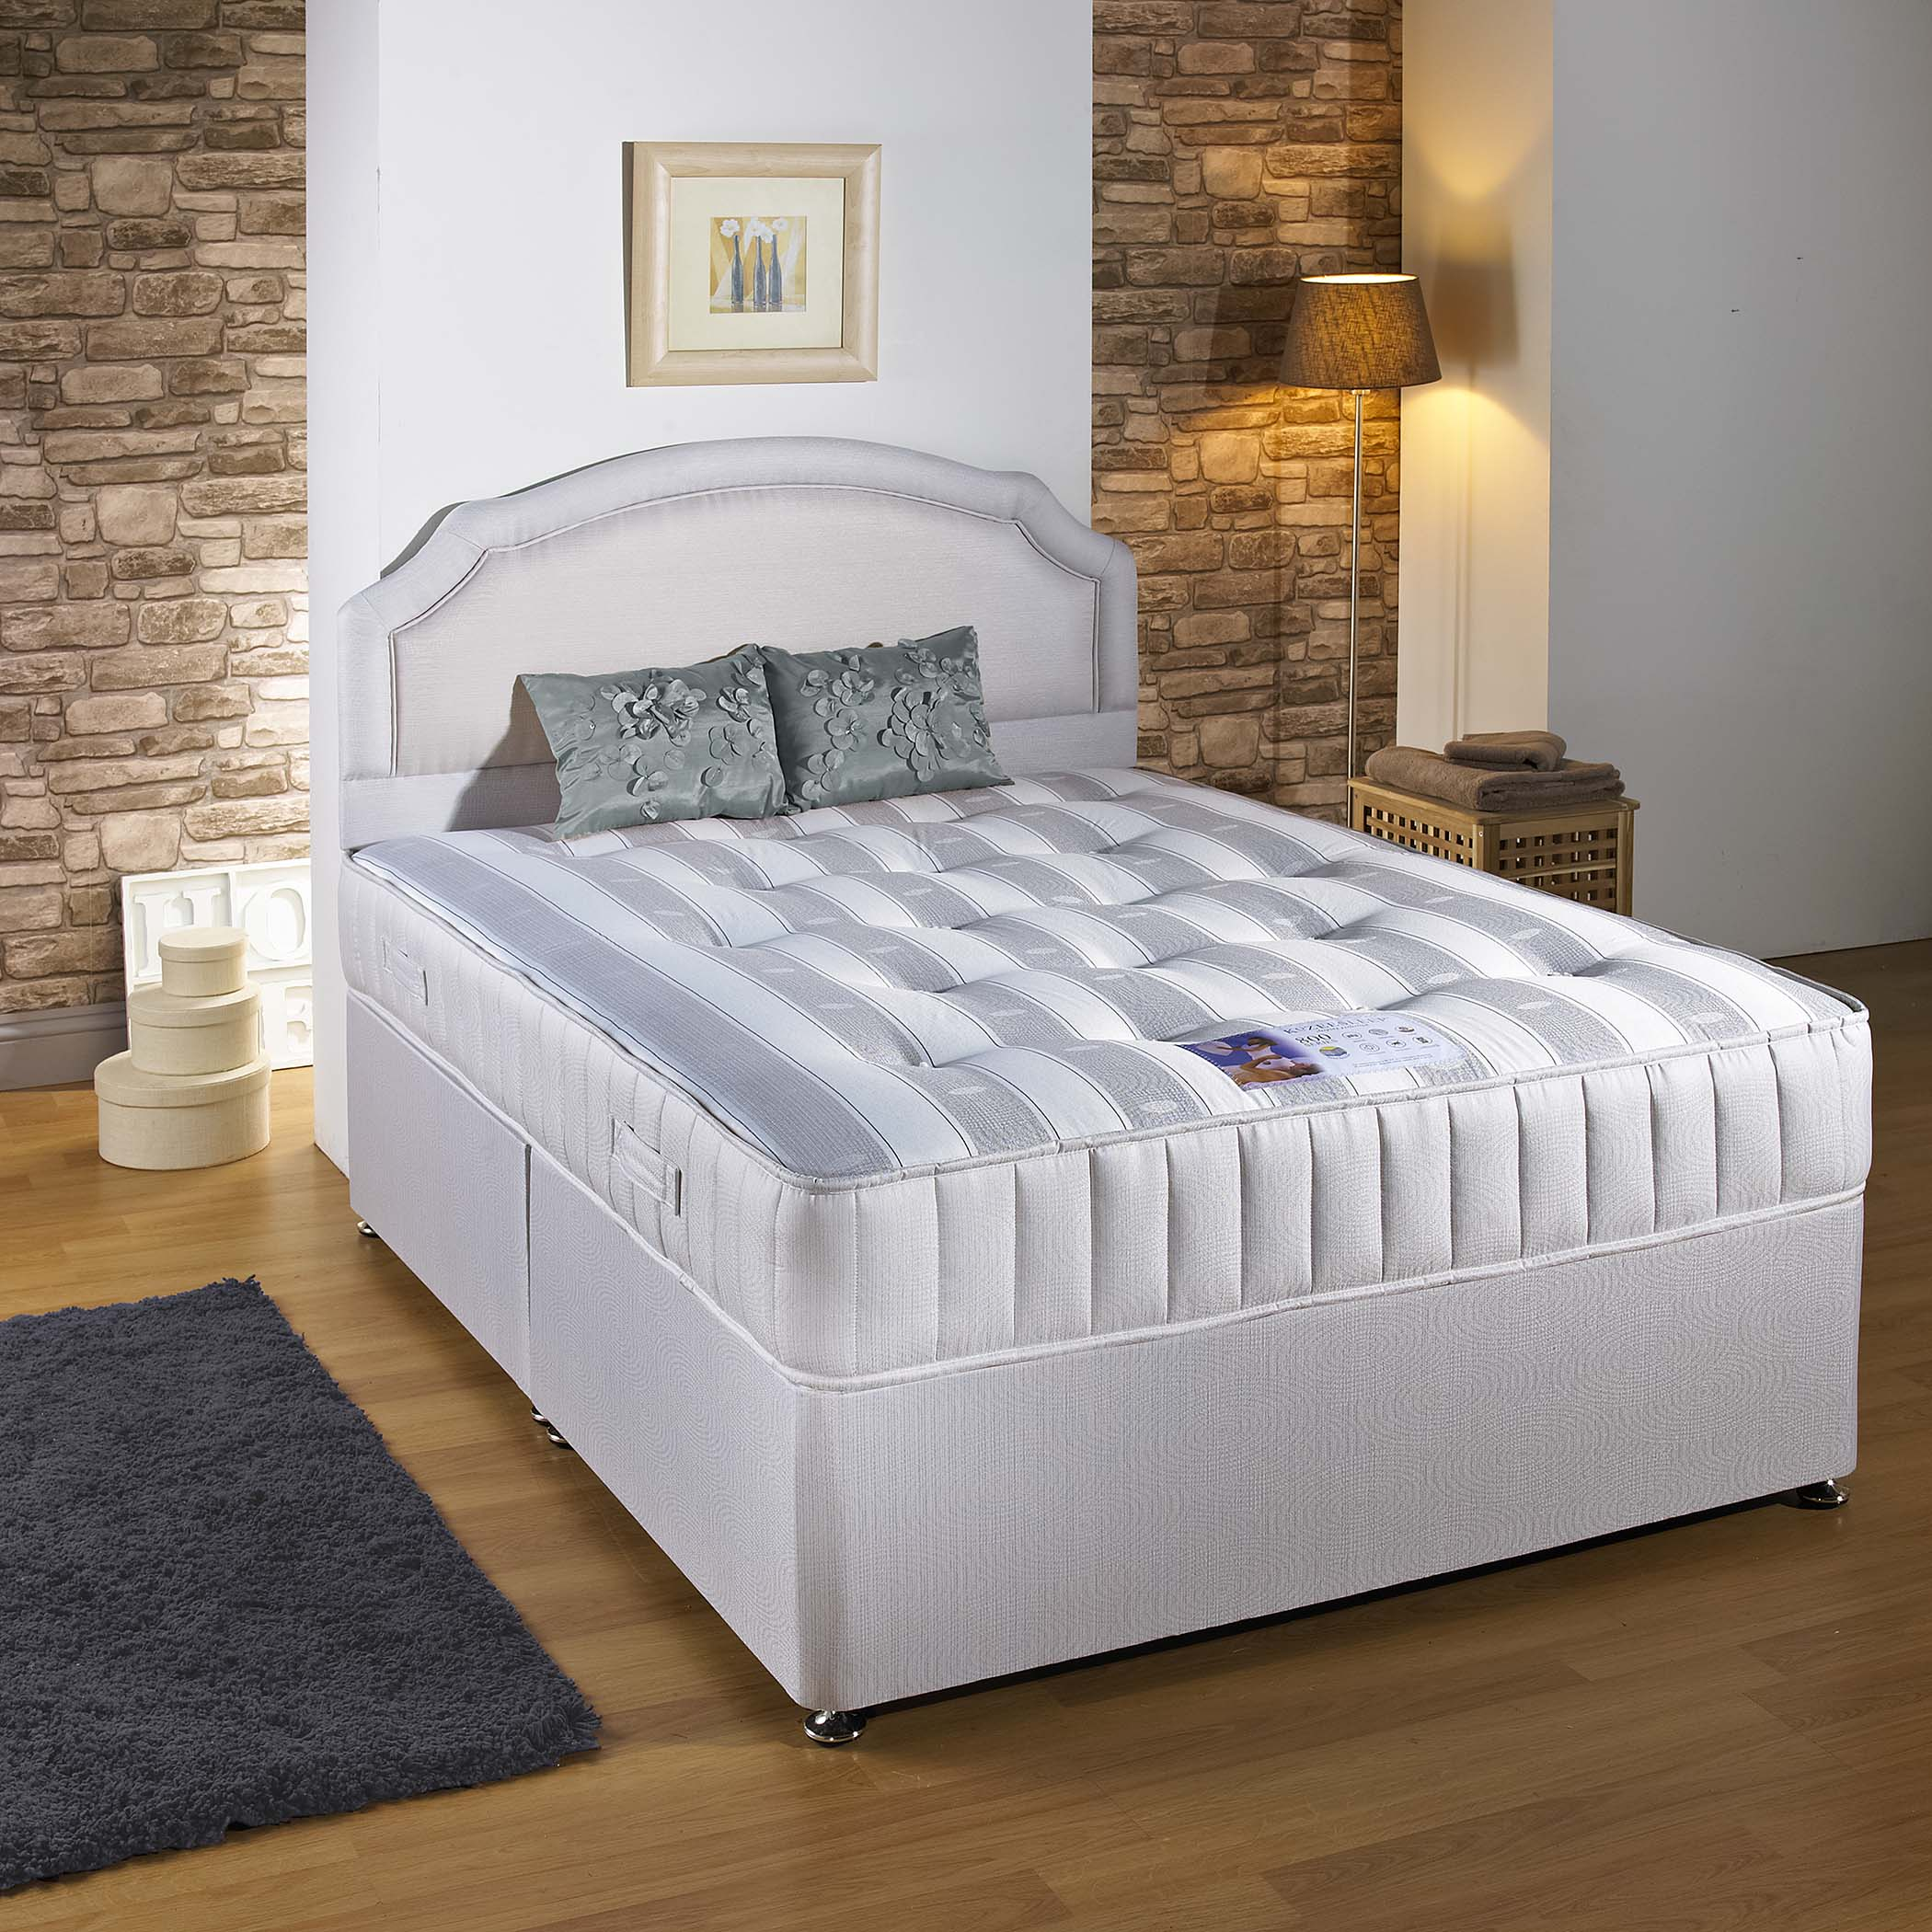 dream sofas wishaw designer sofa sets online divan beds